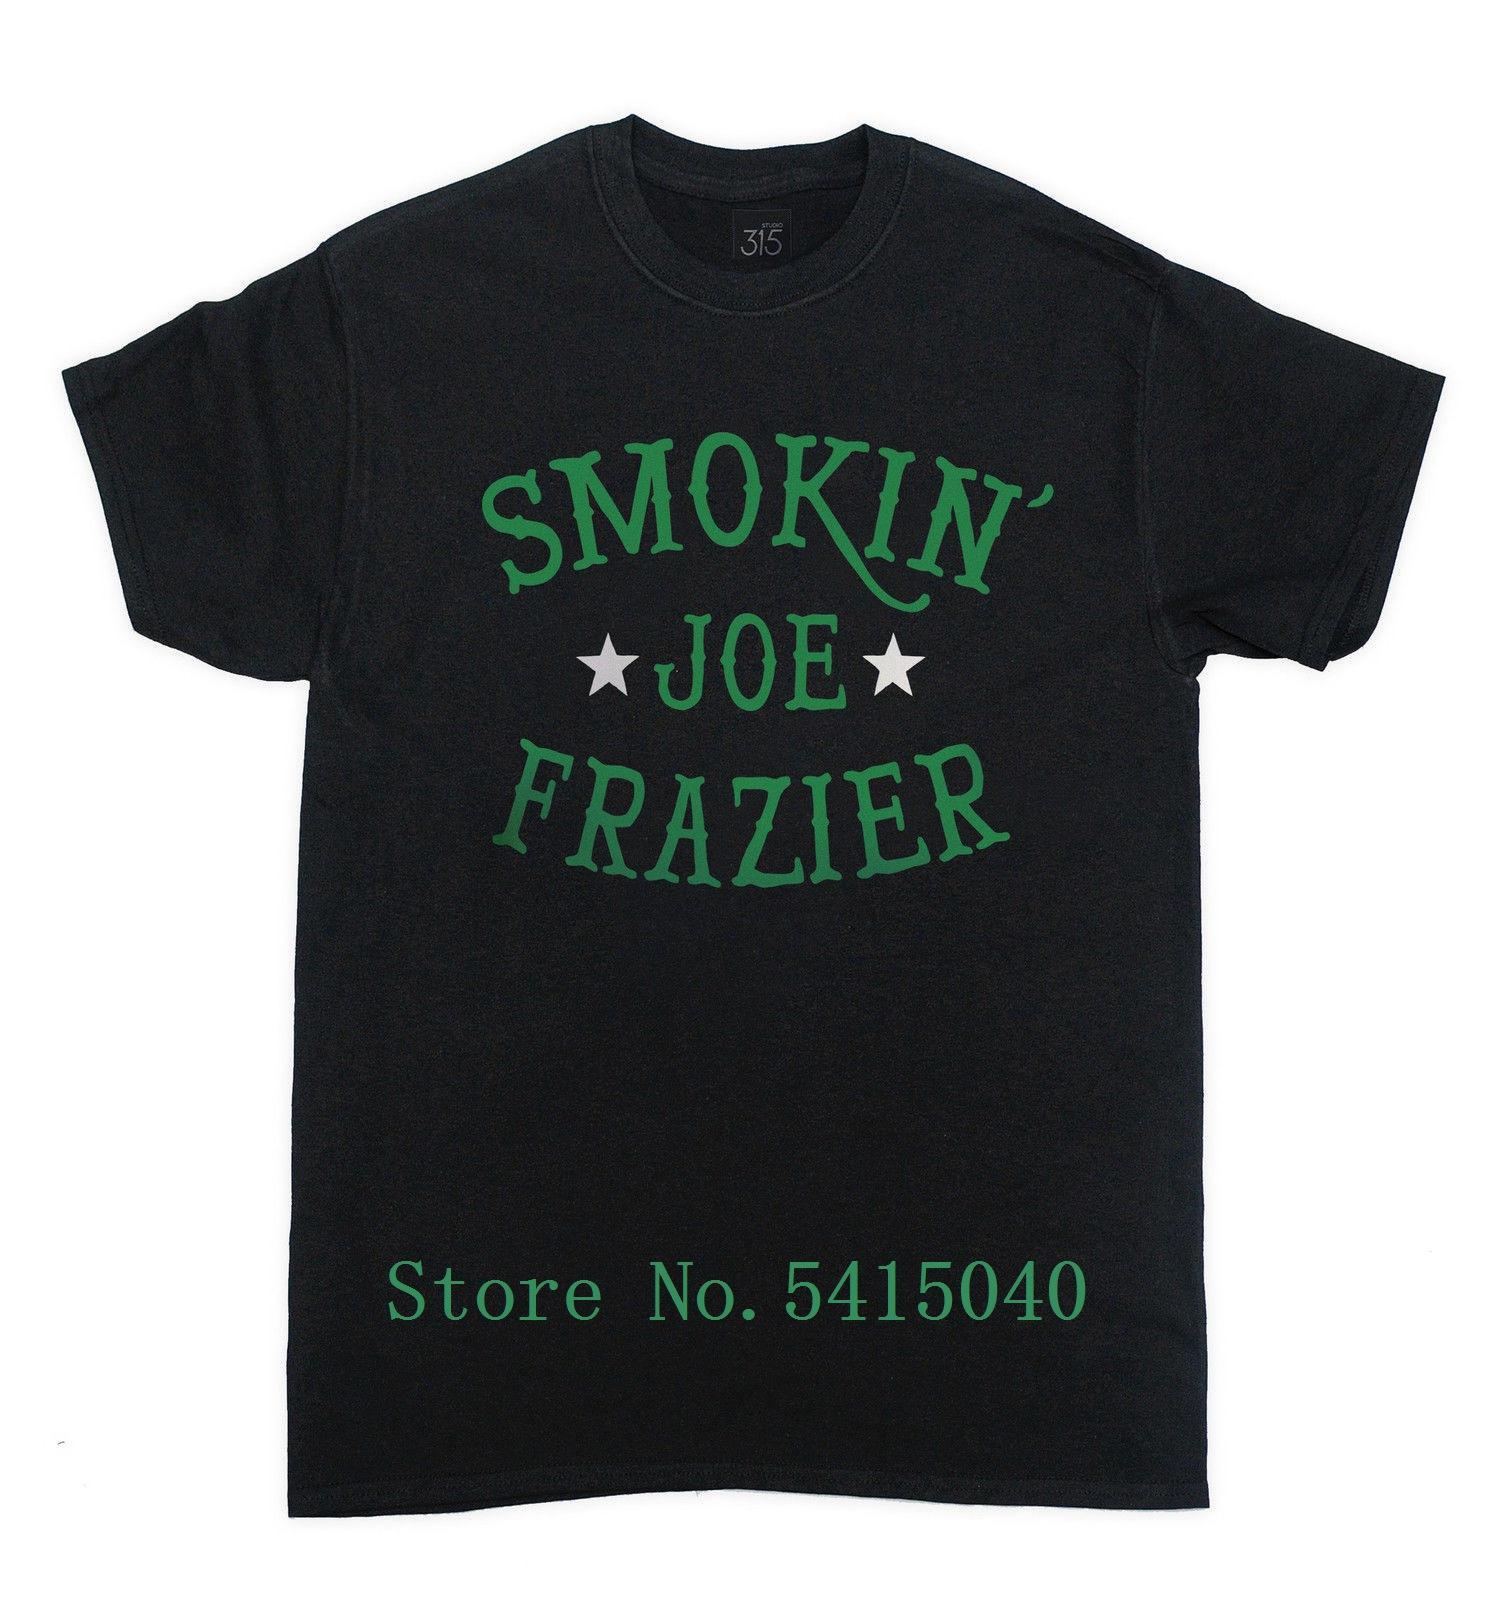 Smokin' Джо Фрейзер T-Shirt - Мода бокса в супертяжелом Легенда ретро Tee Винтаж Прохладный Pride T Shirt Men Мужская футболка